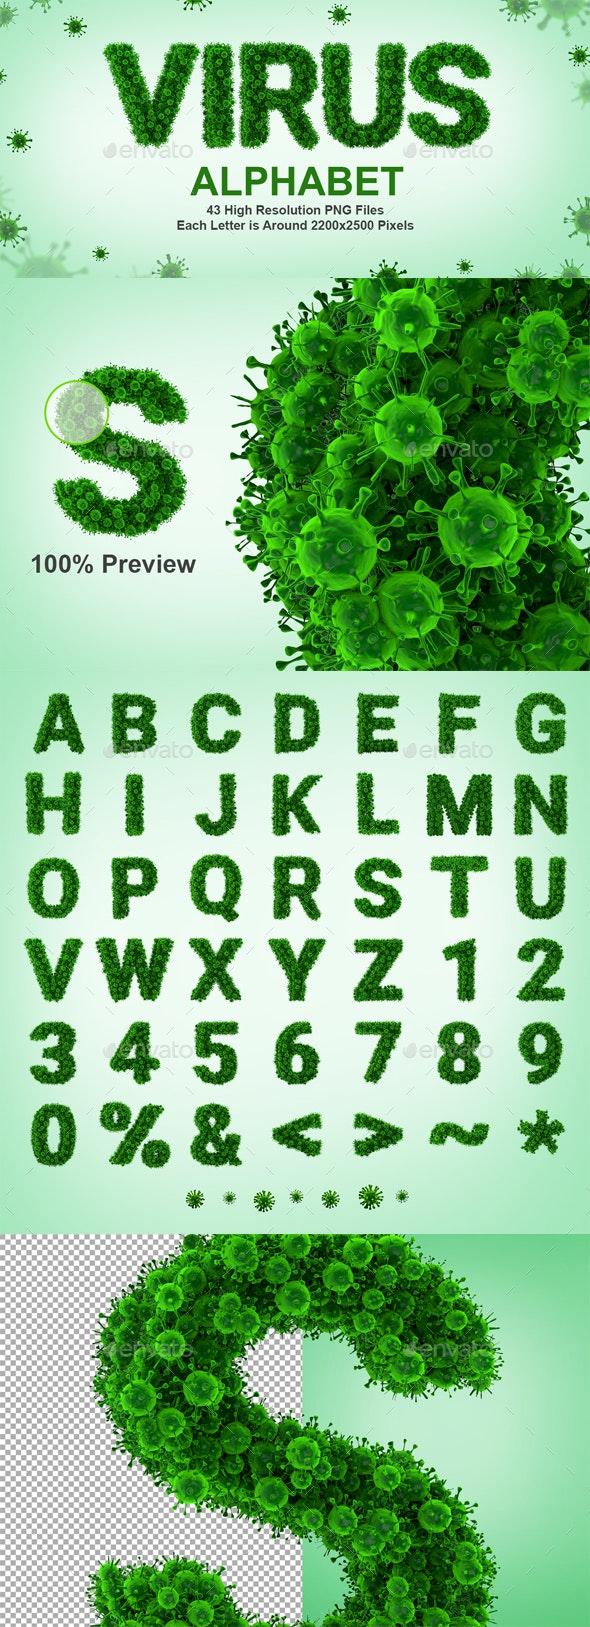 3D Rendered Set of 3D Render Set of Virus or Bacteria Alphabet - Text 3D Renders